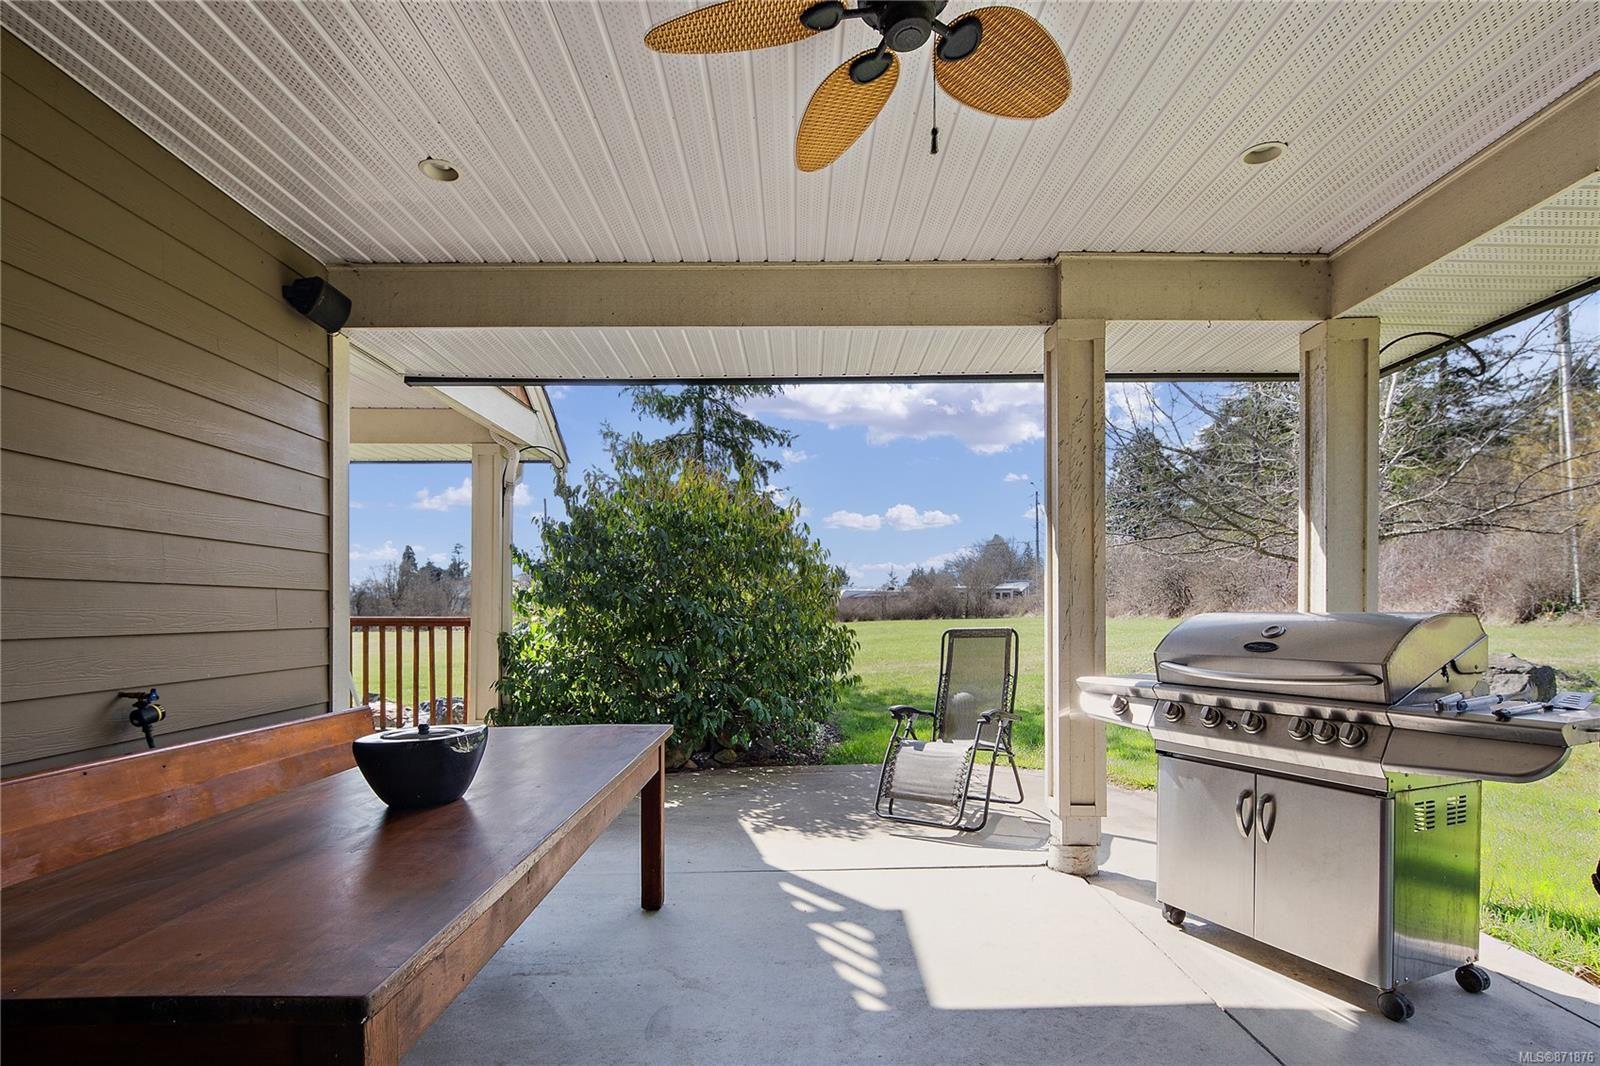 Photo 43: Photos: 4420 Wilkinson Rd in : SW Royal Oak House for sale (Saanich West)  : MLS®# 871876